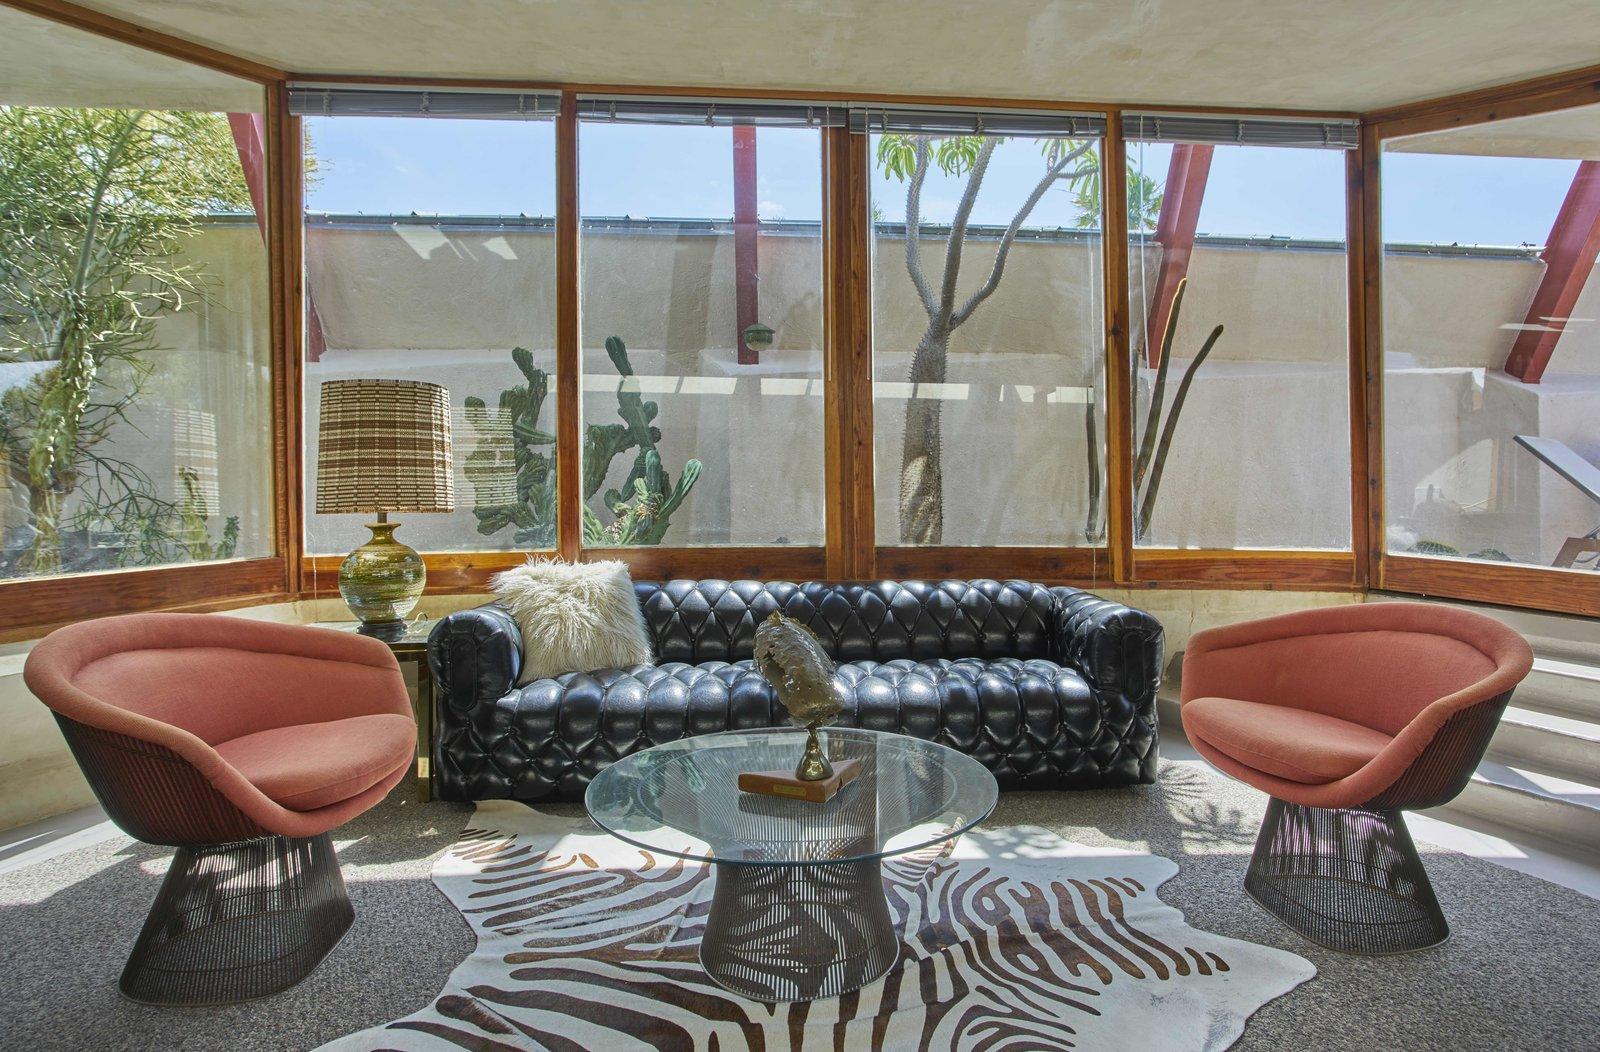 Photo 12 of 13 in Escape to a John Lautner Micro-Resort in the Californian Desert